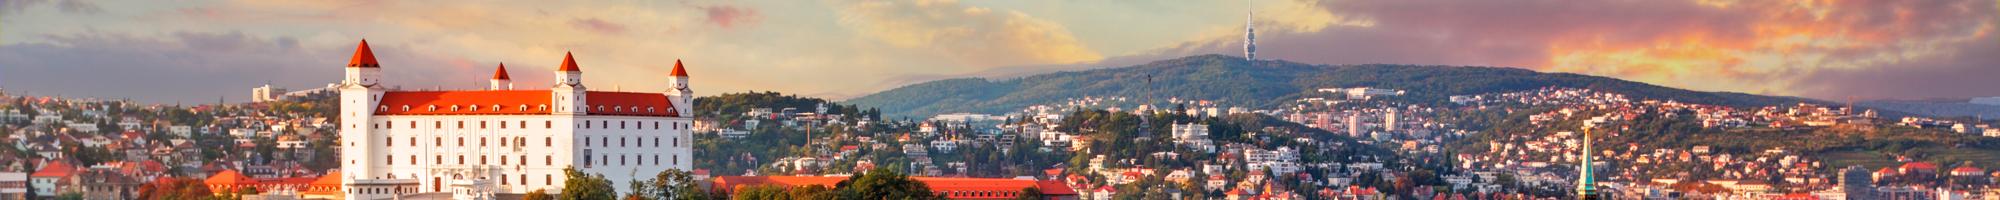 Hoteles en Eslovaquia